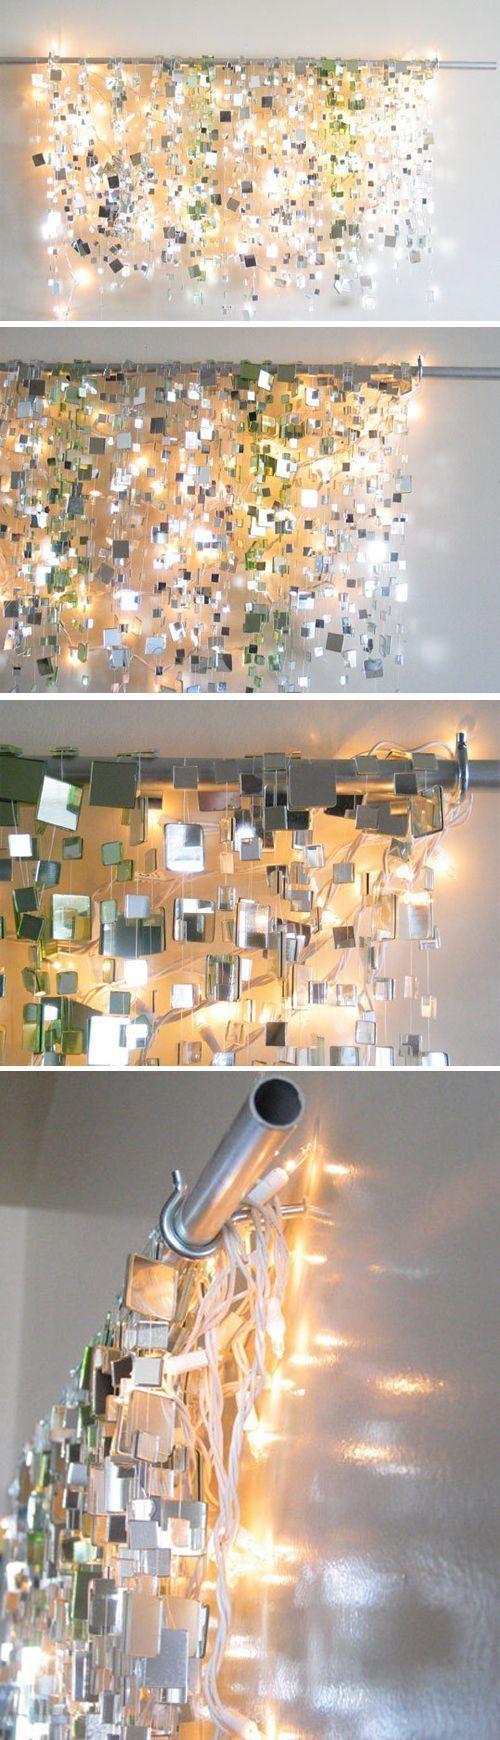 best 25+ mirror tiles ideas on pinterest   antique mirror tiles